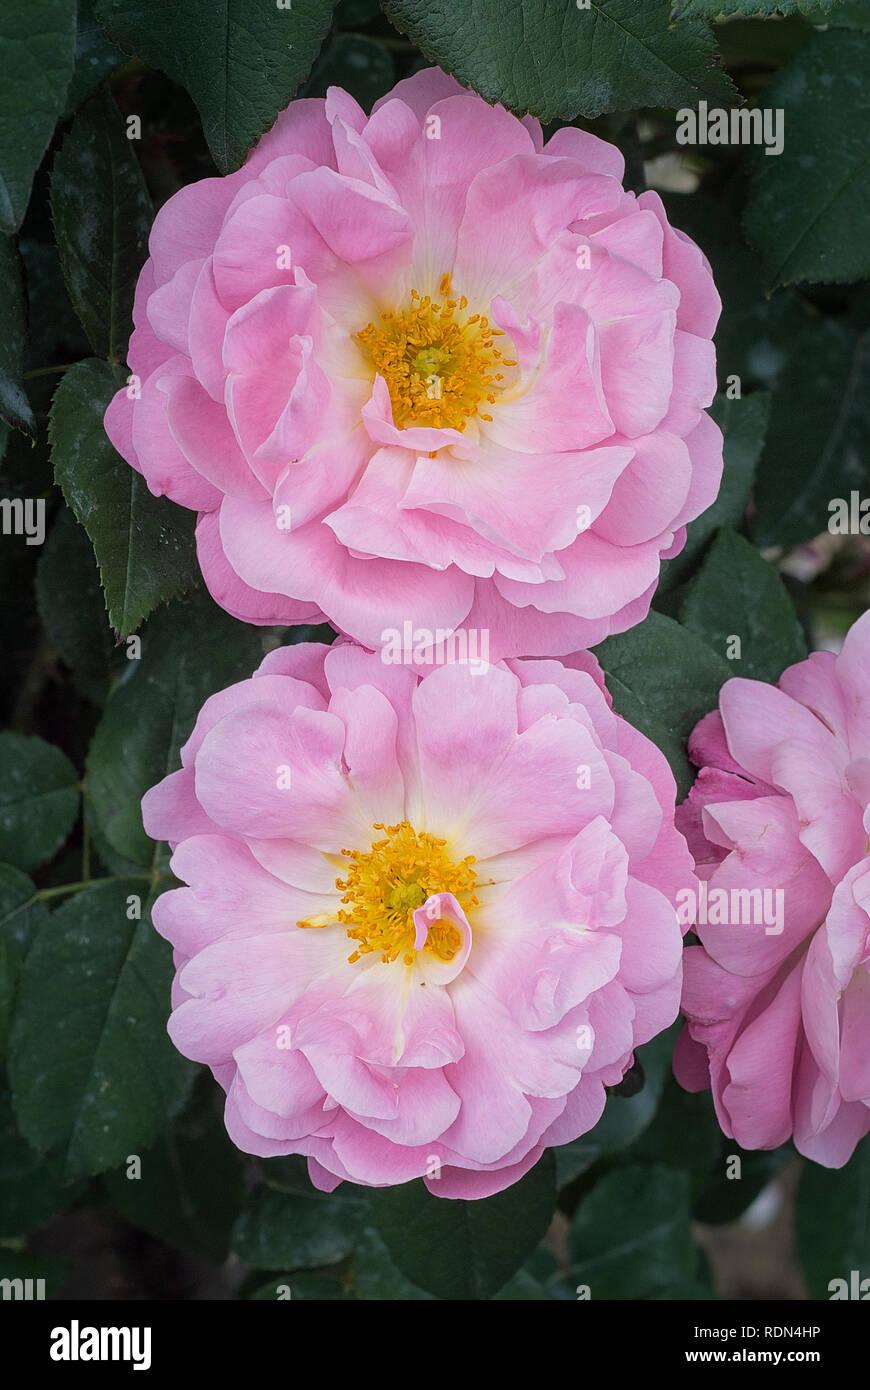 Rosa Cv Belle Amour Rosaceae Shurb Alba Damasco Flor